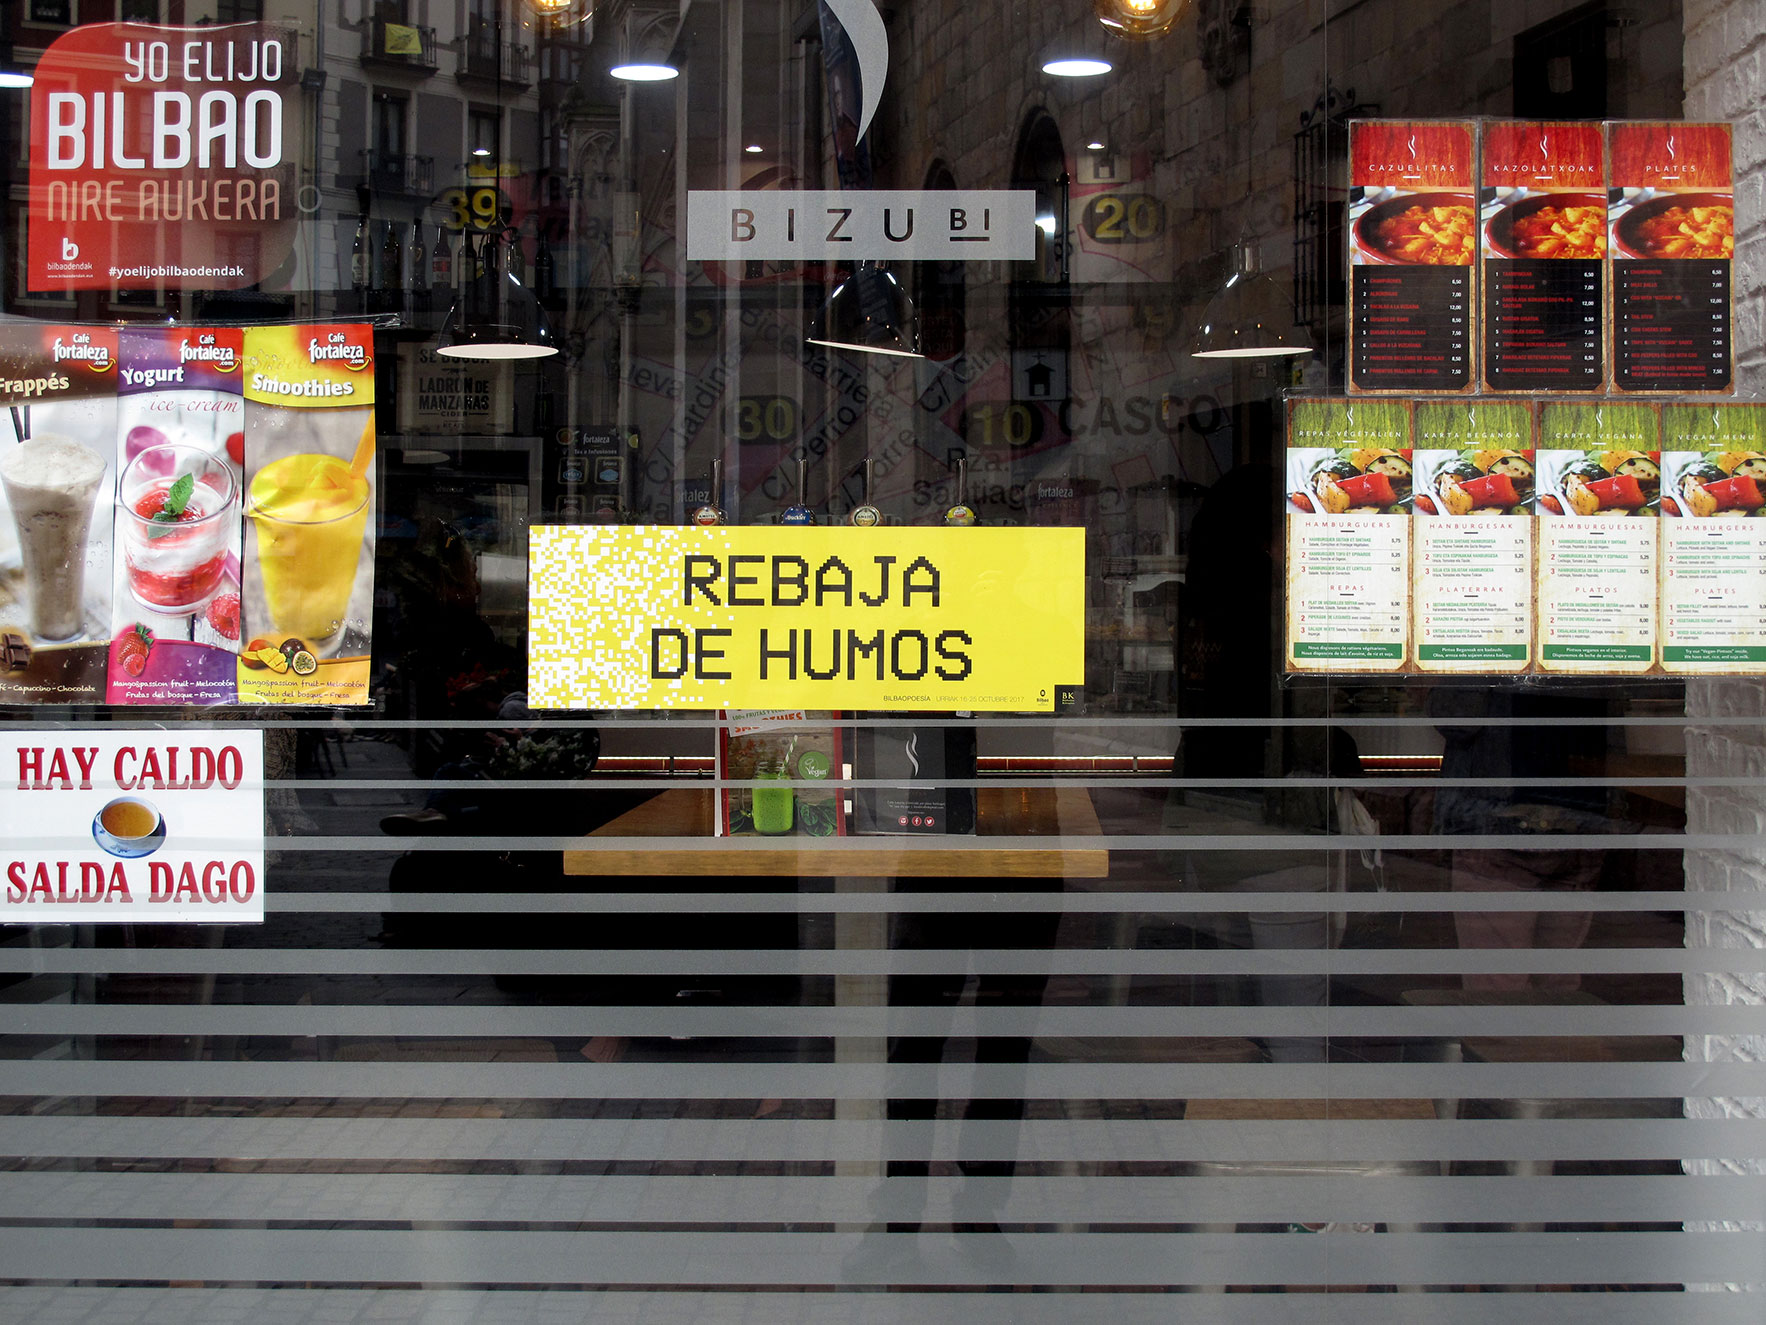 Bilbao poesía escaparate bar Bilbao